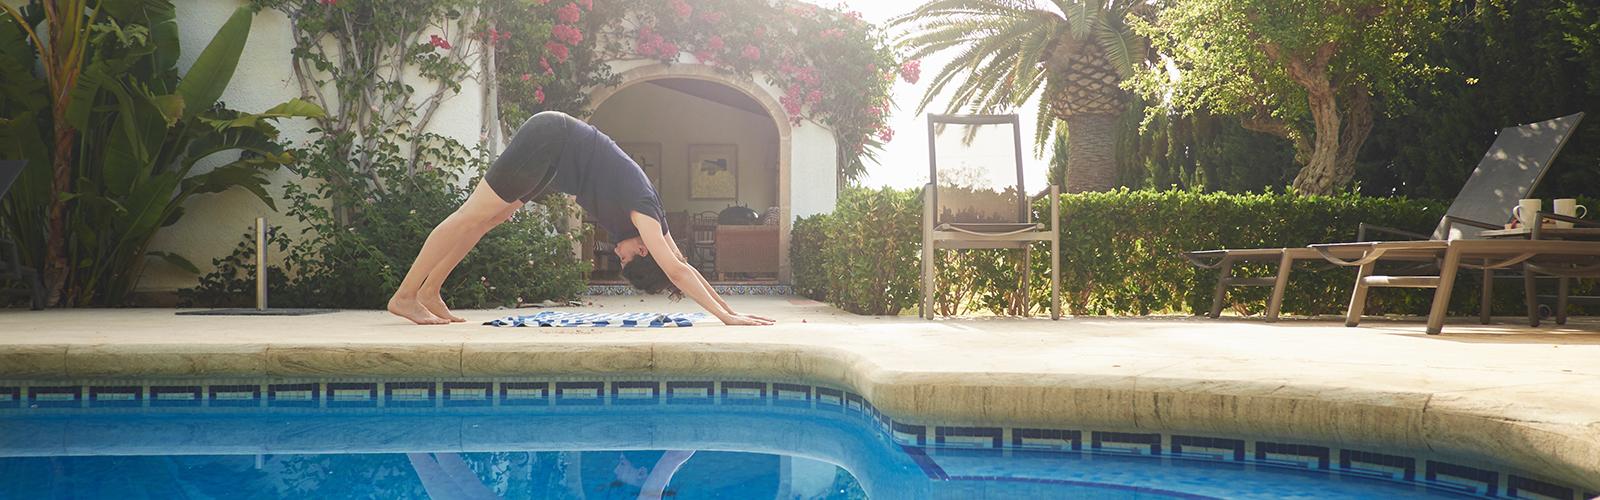 Frau, die Yoga neben einem Swimmingpool praktiziert